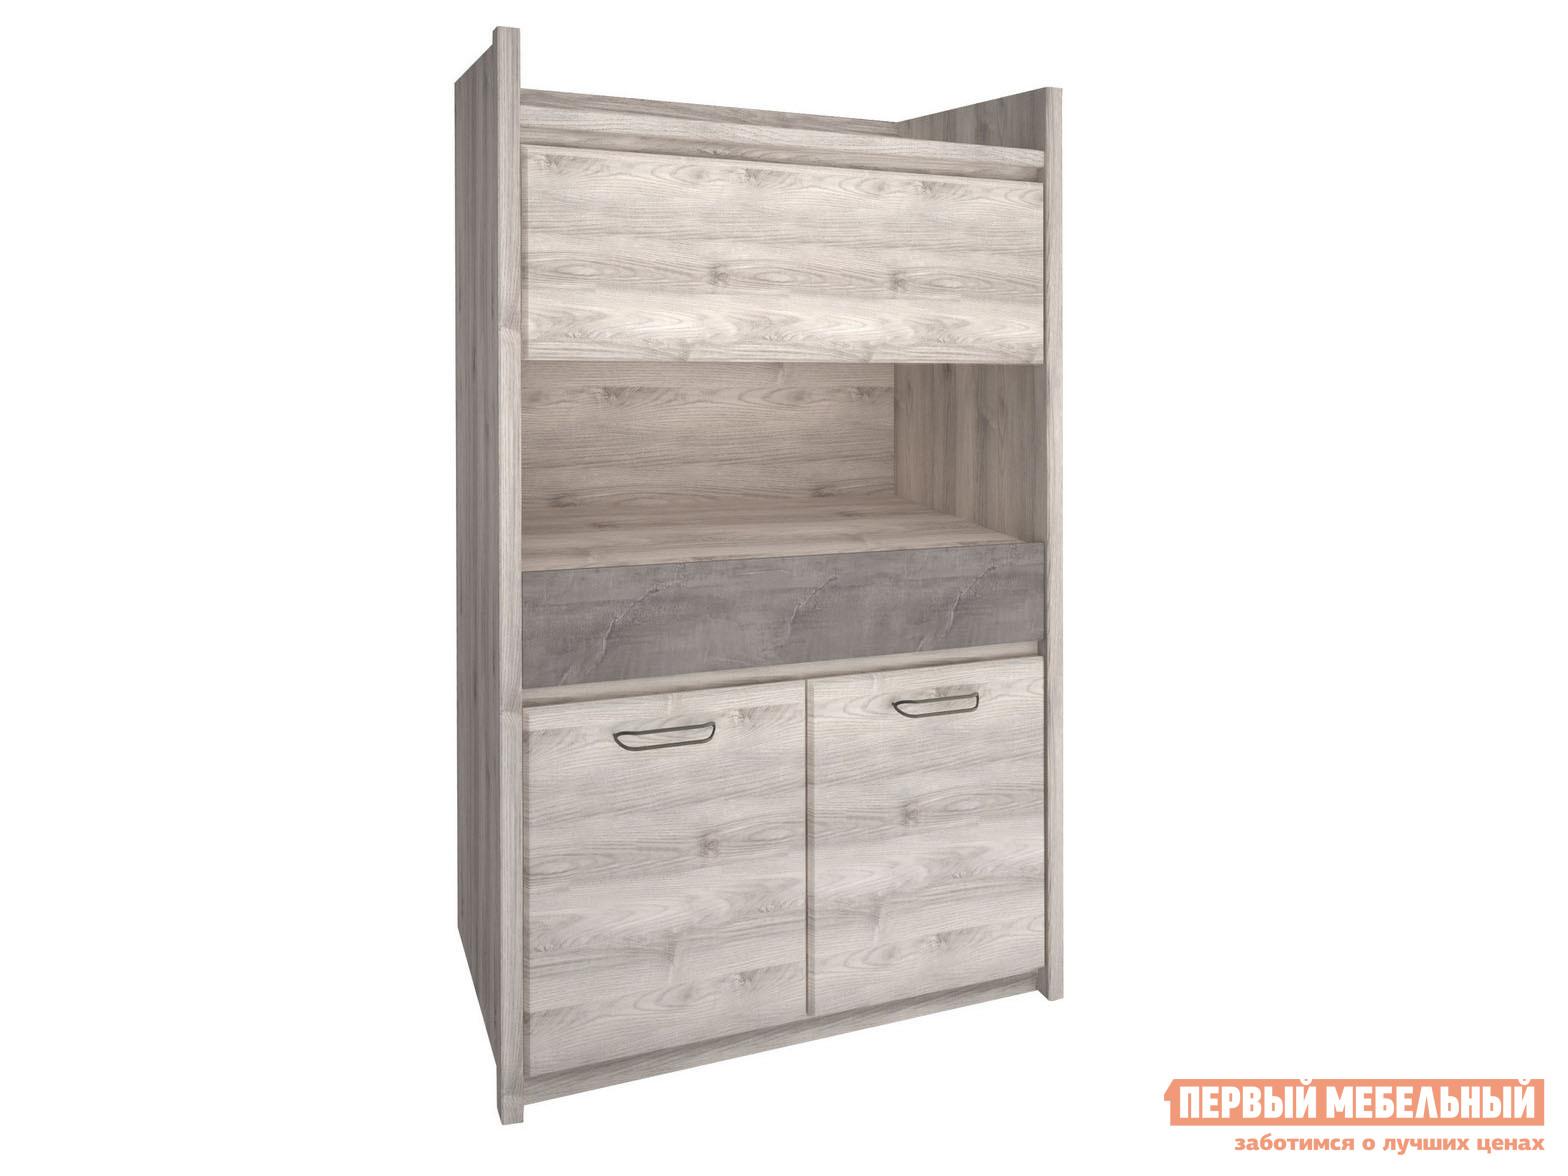 Шкаф-витрина Первый Мебельный Шкаф-витрина низкий 2 Джаз цены онлайн